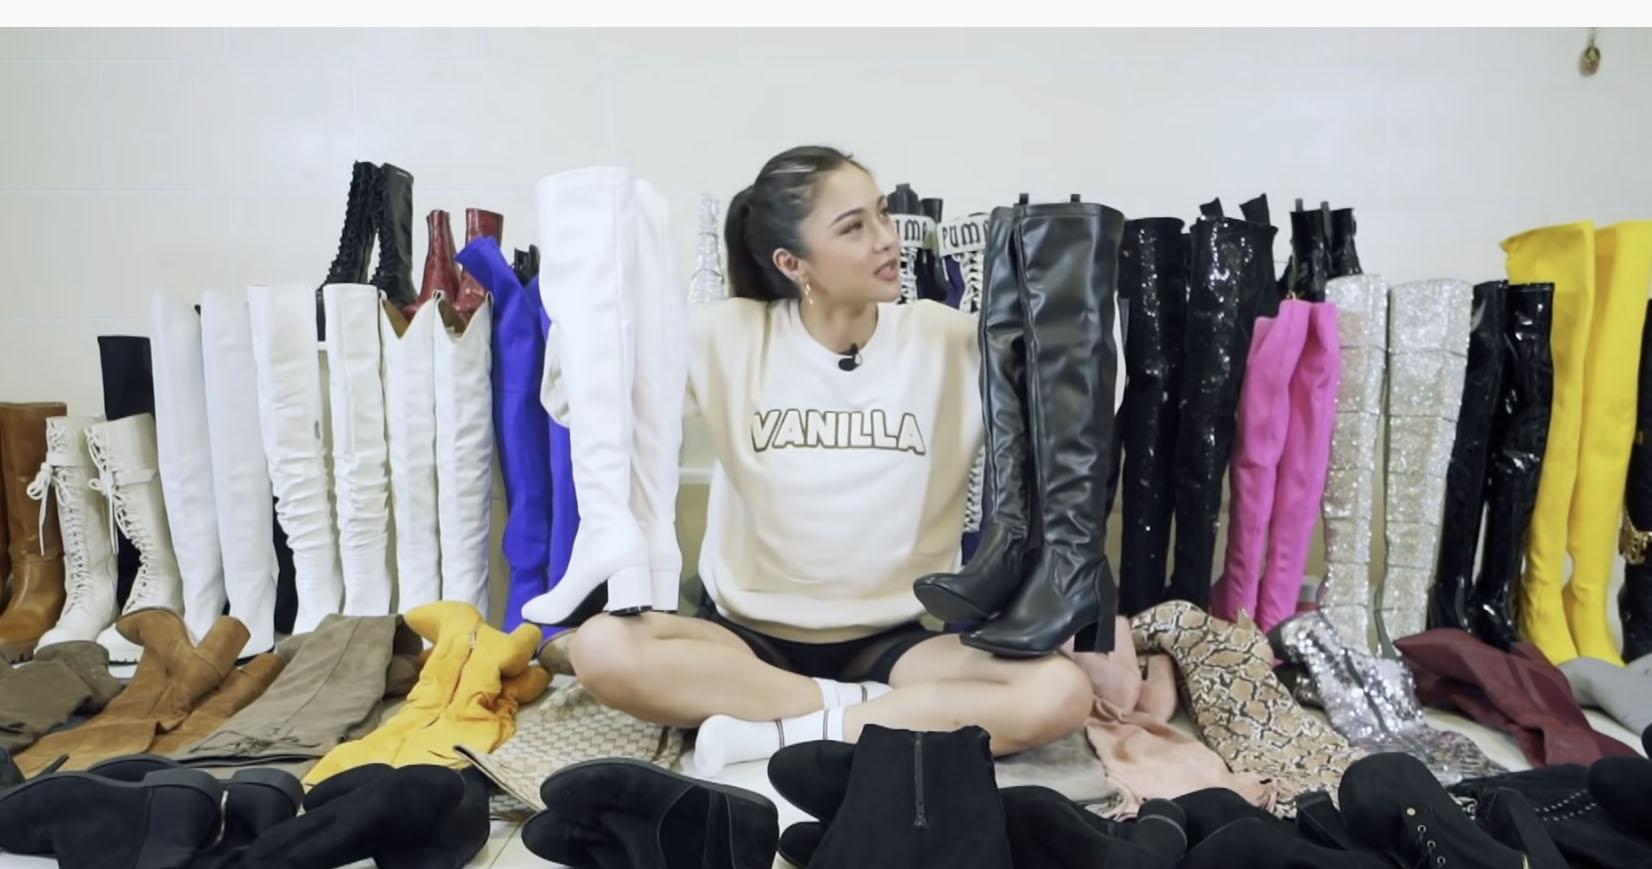 Youtube Vlog Screengrab: Kim Chiu boots collection